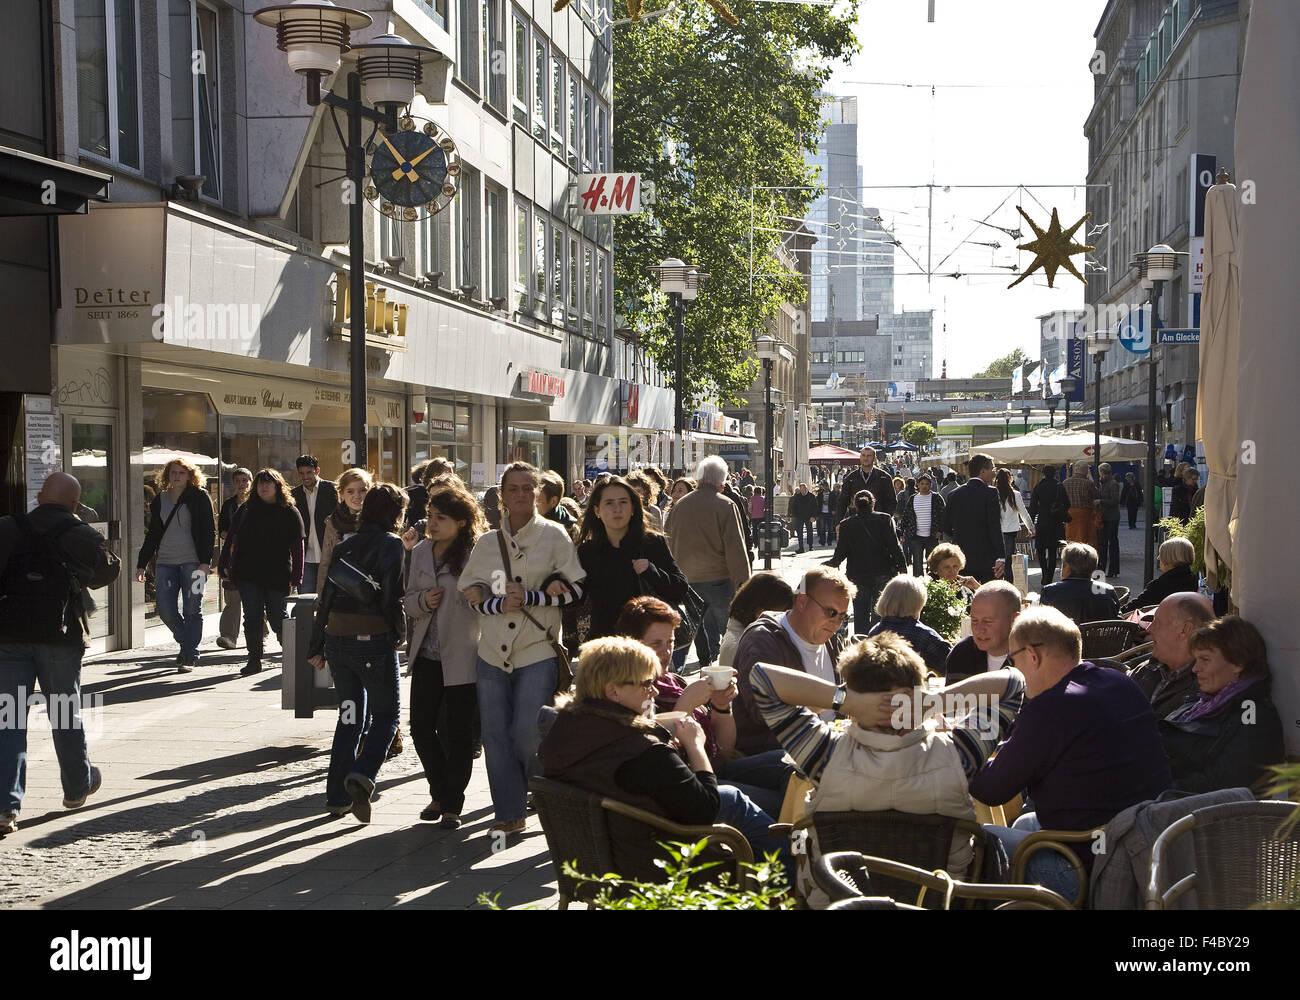 People in a pedestrian zone, Essen, Germany - Stock Image